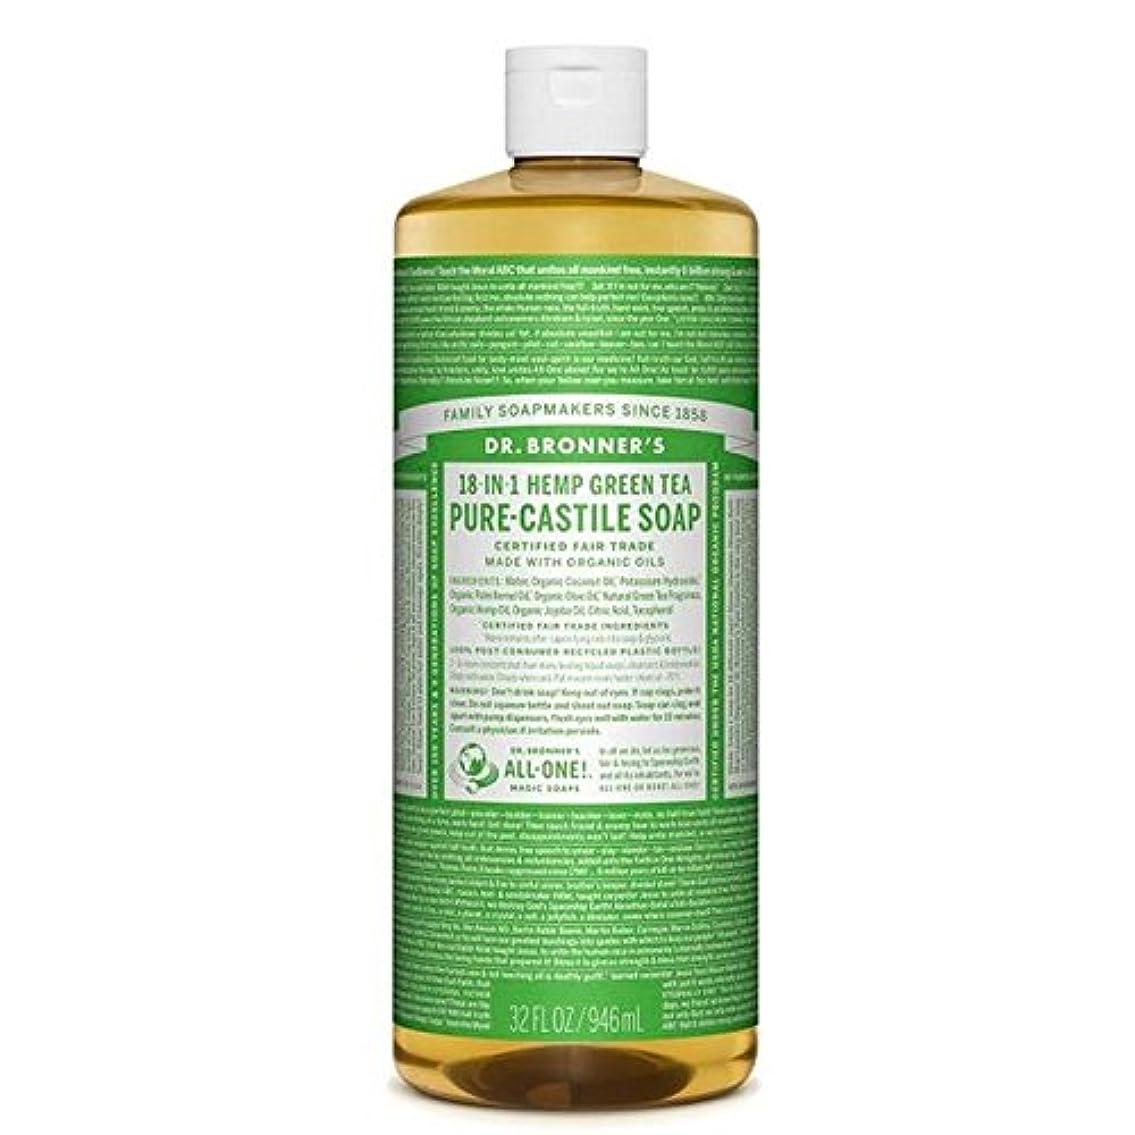 Dr Bronner Organic Green Tea Castile Liquid Soap 946ml - のブロナー有機緑茶カスティーリャ液体石鹸946ミリリットル [並行輸入品]